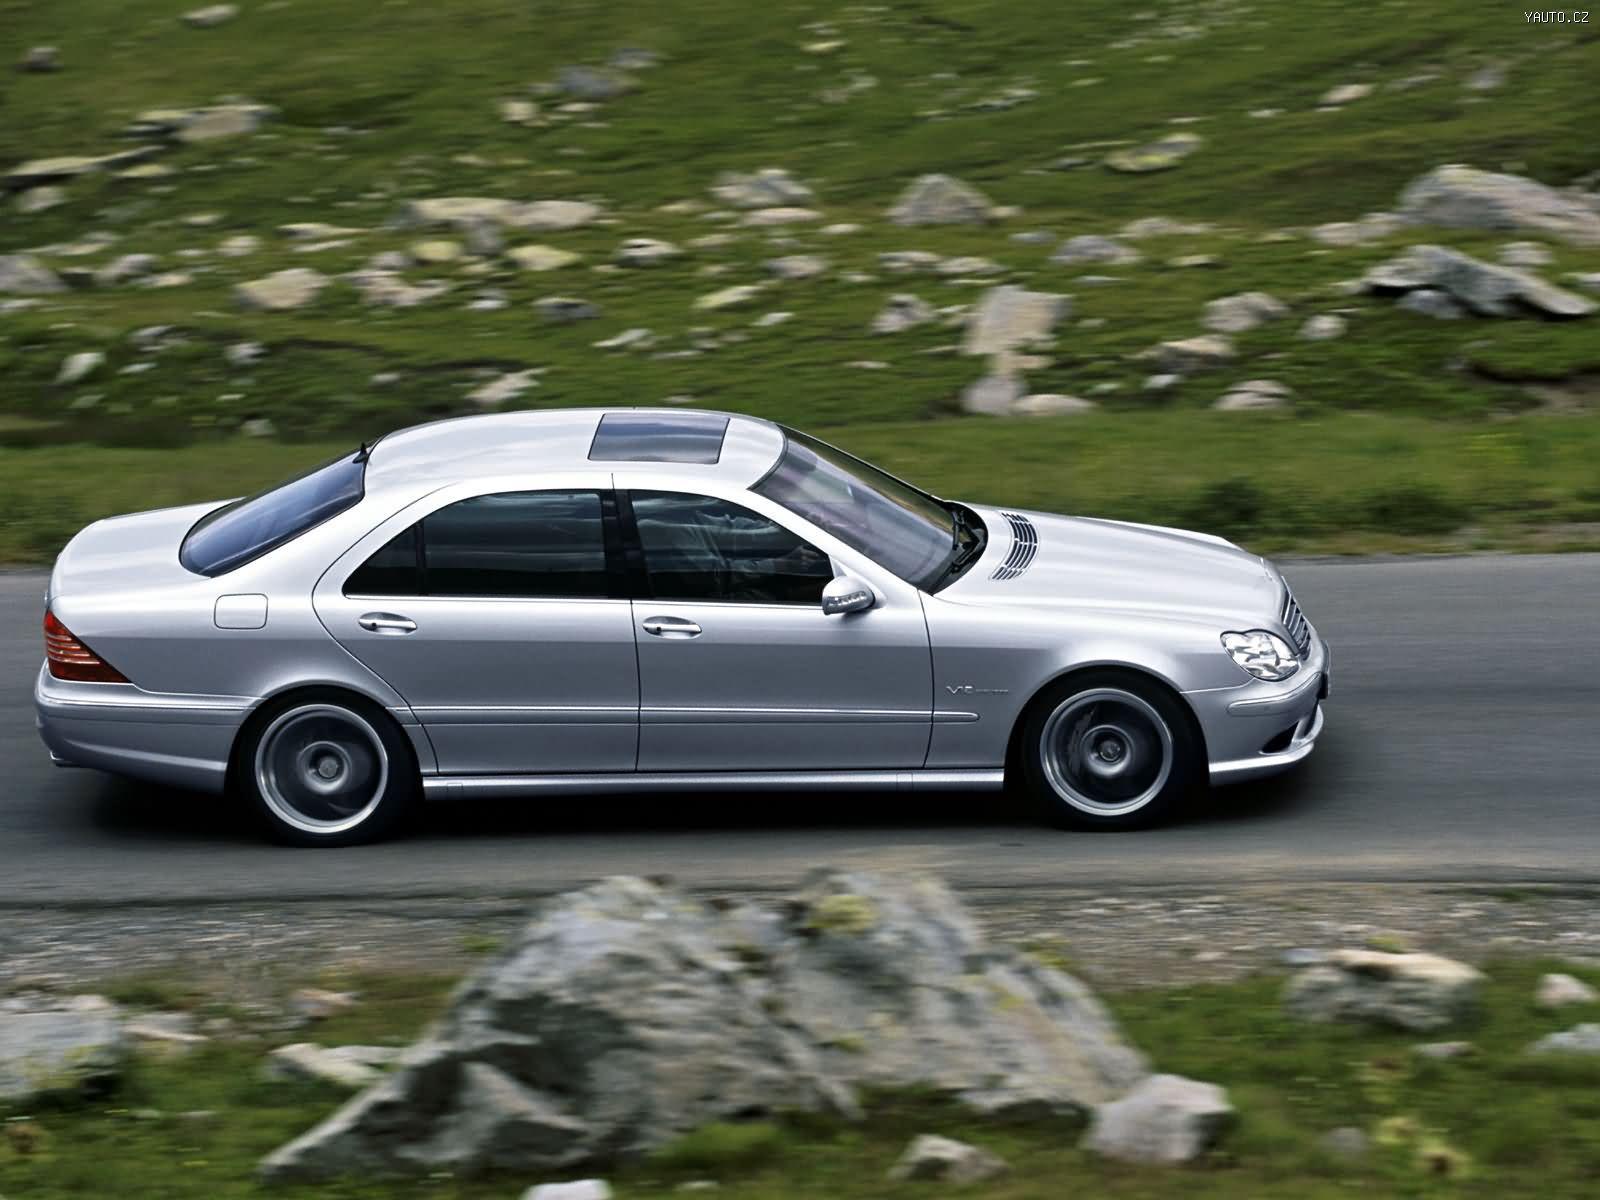 Mercedes Benz S65 Amg 2004 Auta Na Plochu Tapety Na